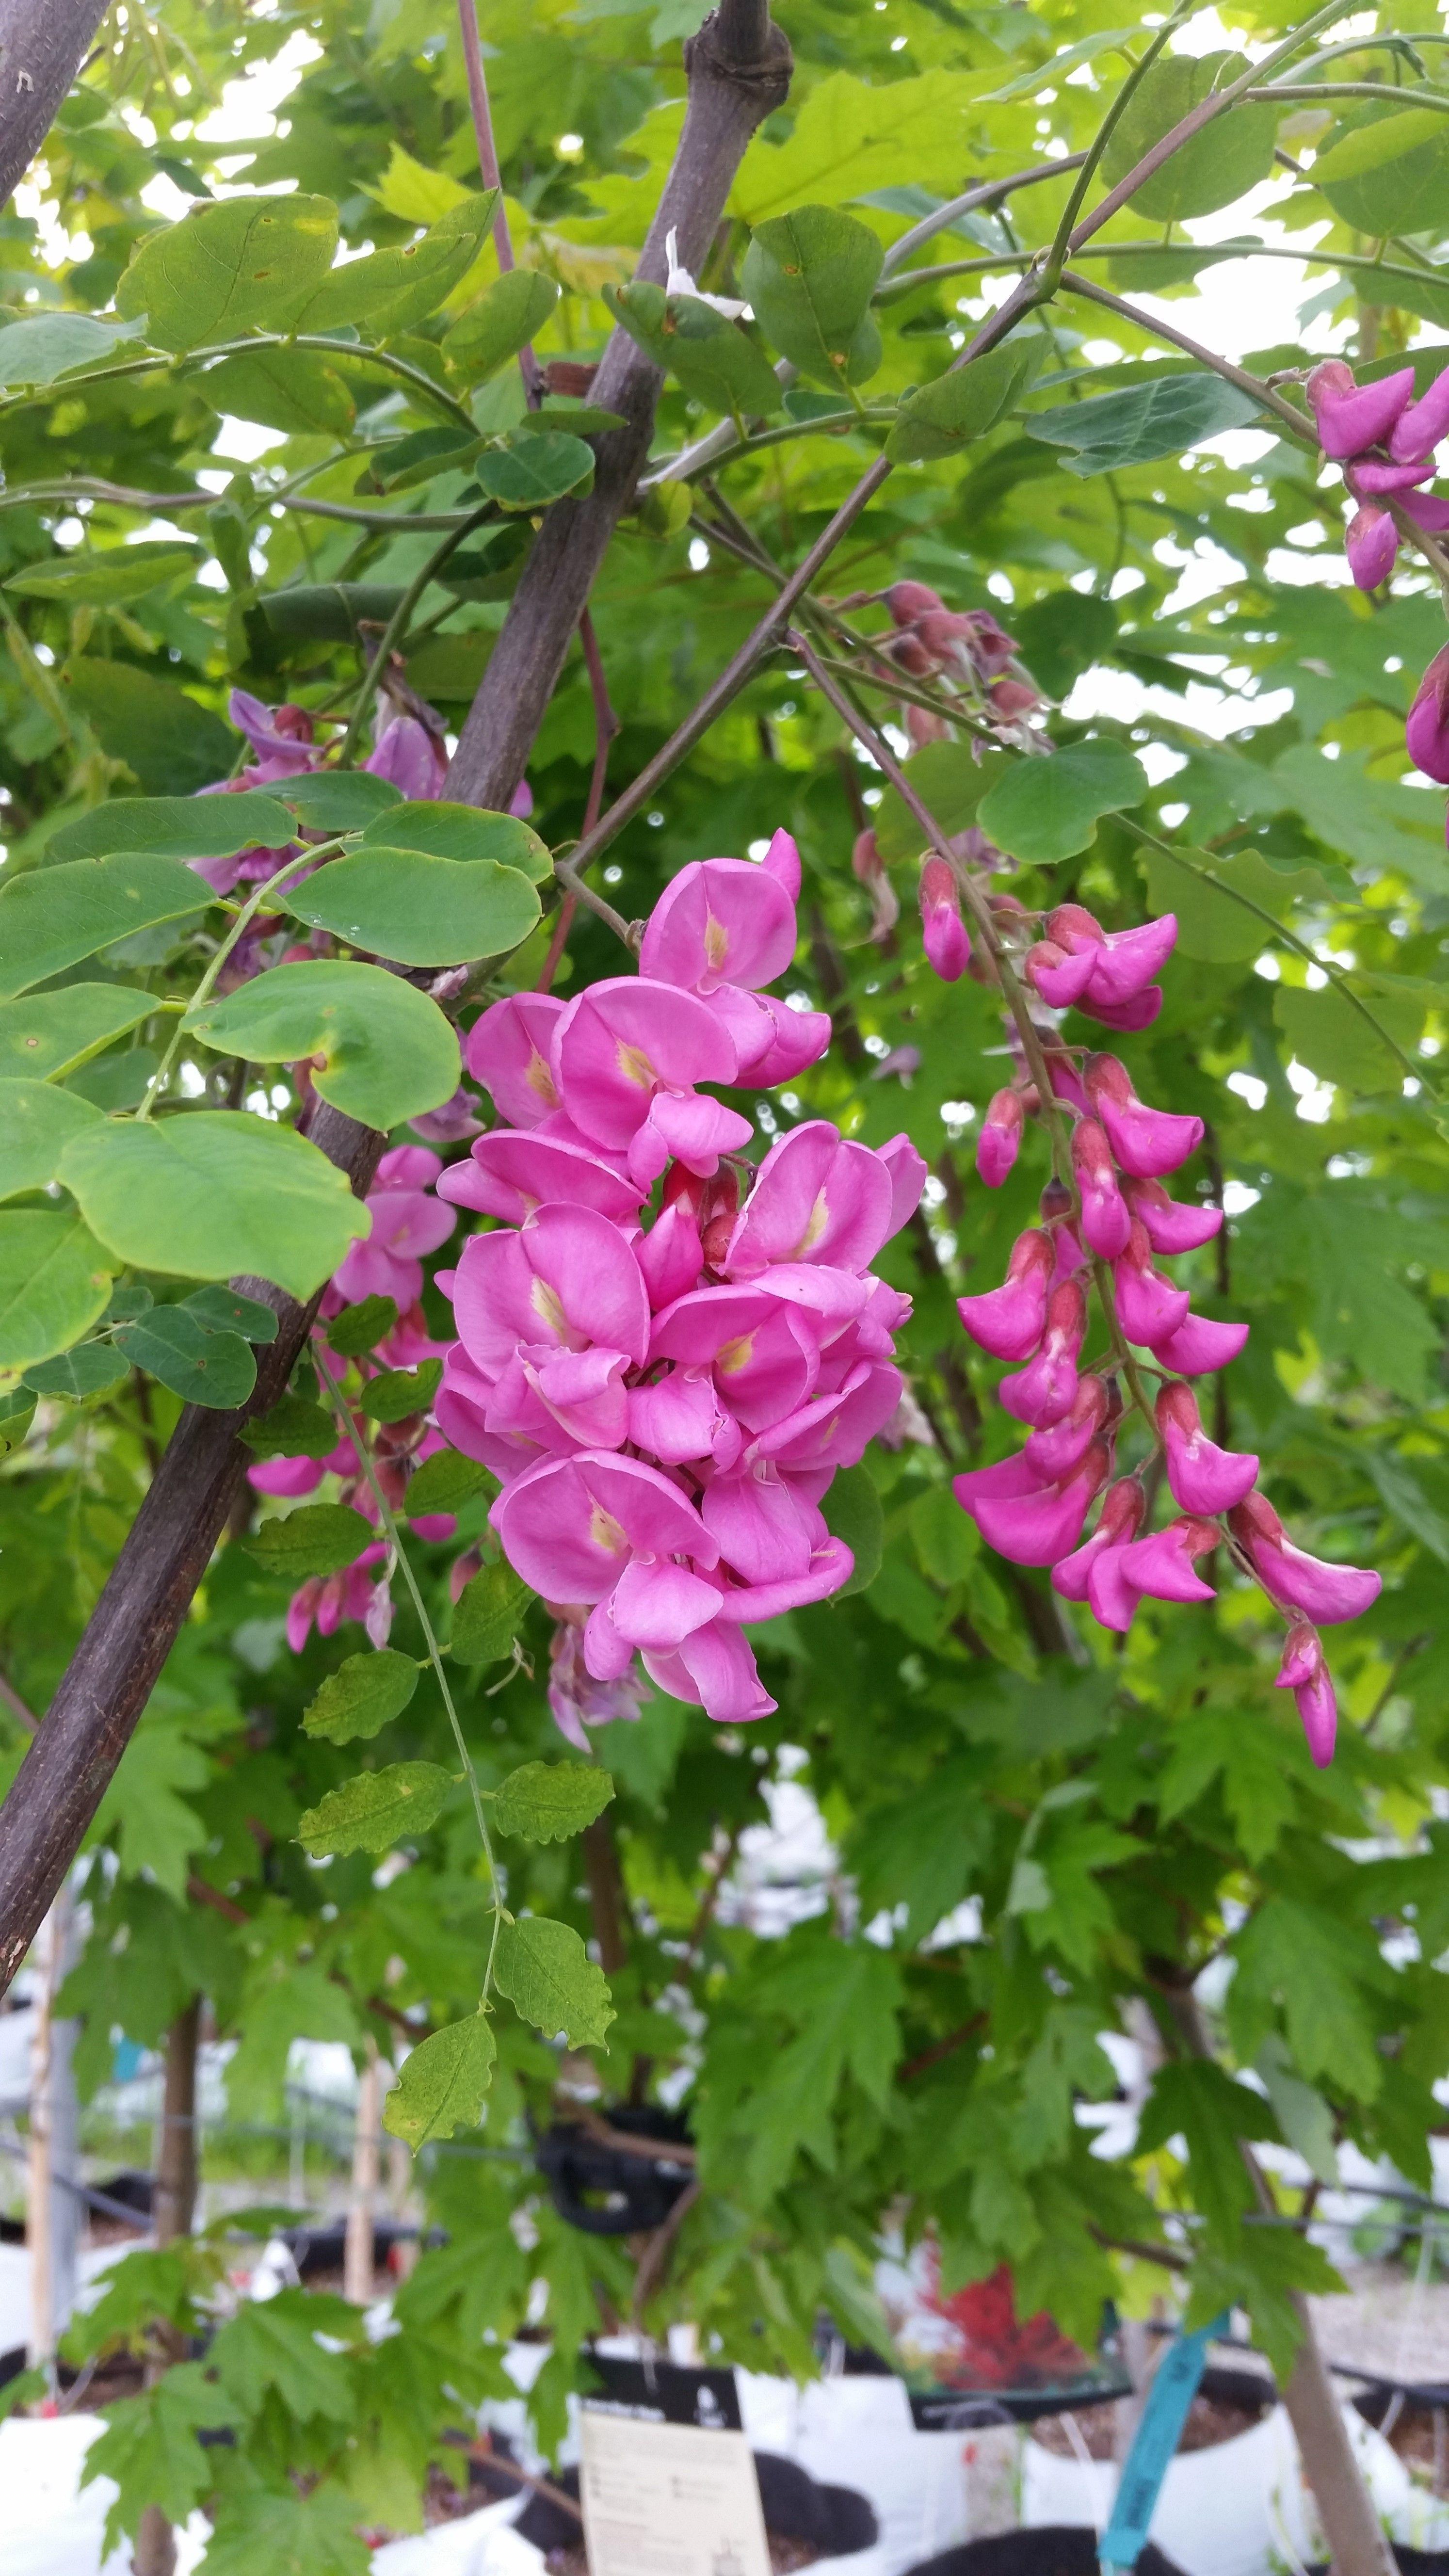 Black Locust Robinia Psuedoacacia Is A Tall Wonderful Native Tree It Can Be Found Growing In Ope Purple Flowering Tree Beautiful Flowers Fast Growing Trees